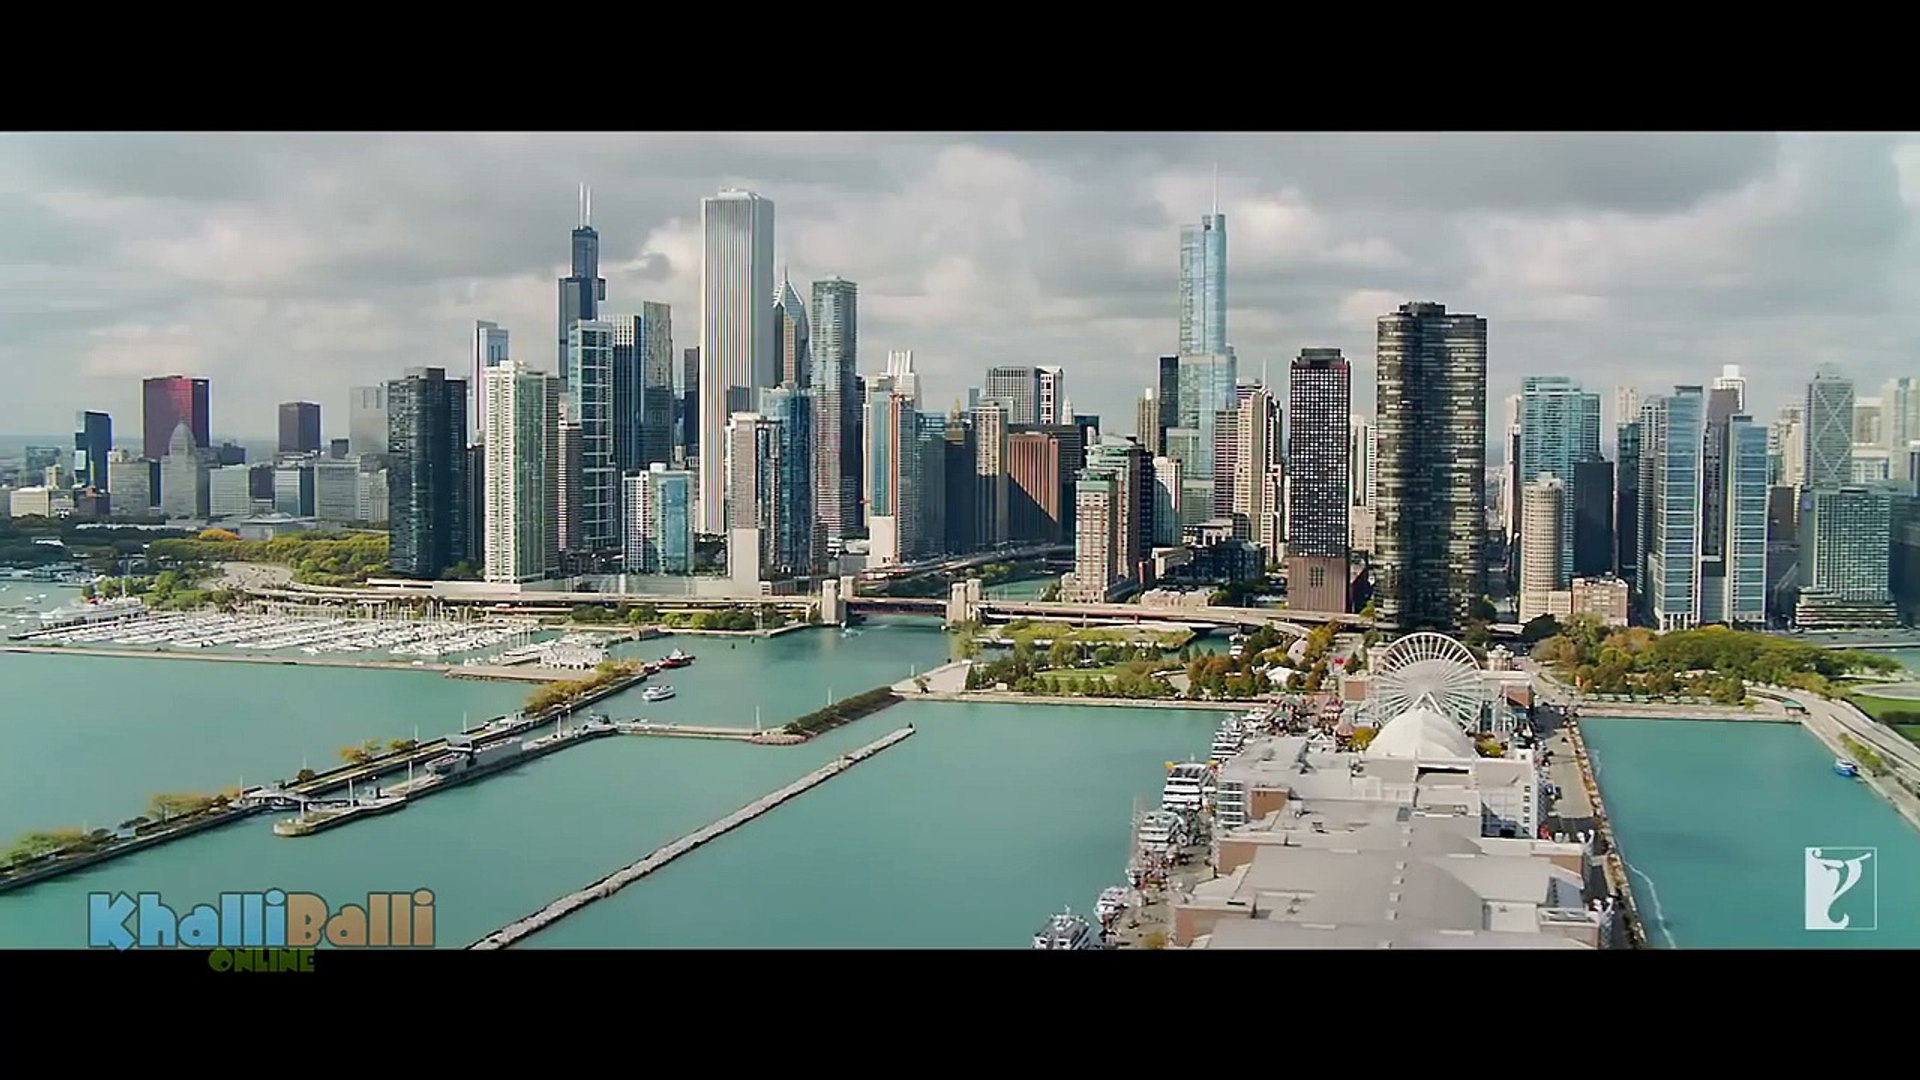 DHOOM_4 - Official teaser trailer Release _ Salman Khan _ Katrina Kaif _ Ranveer Singh _ Fanmade